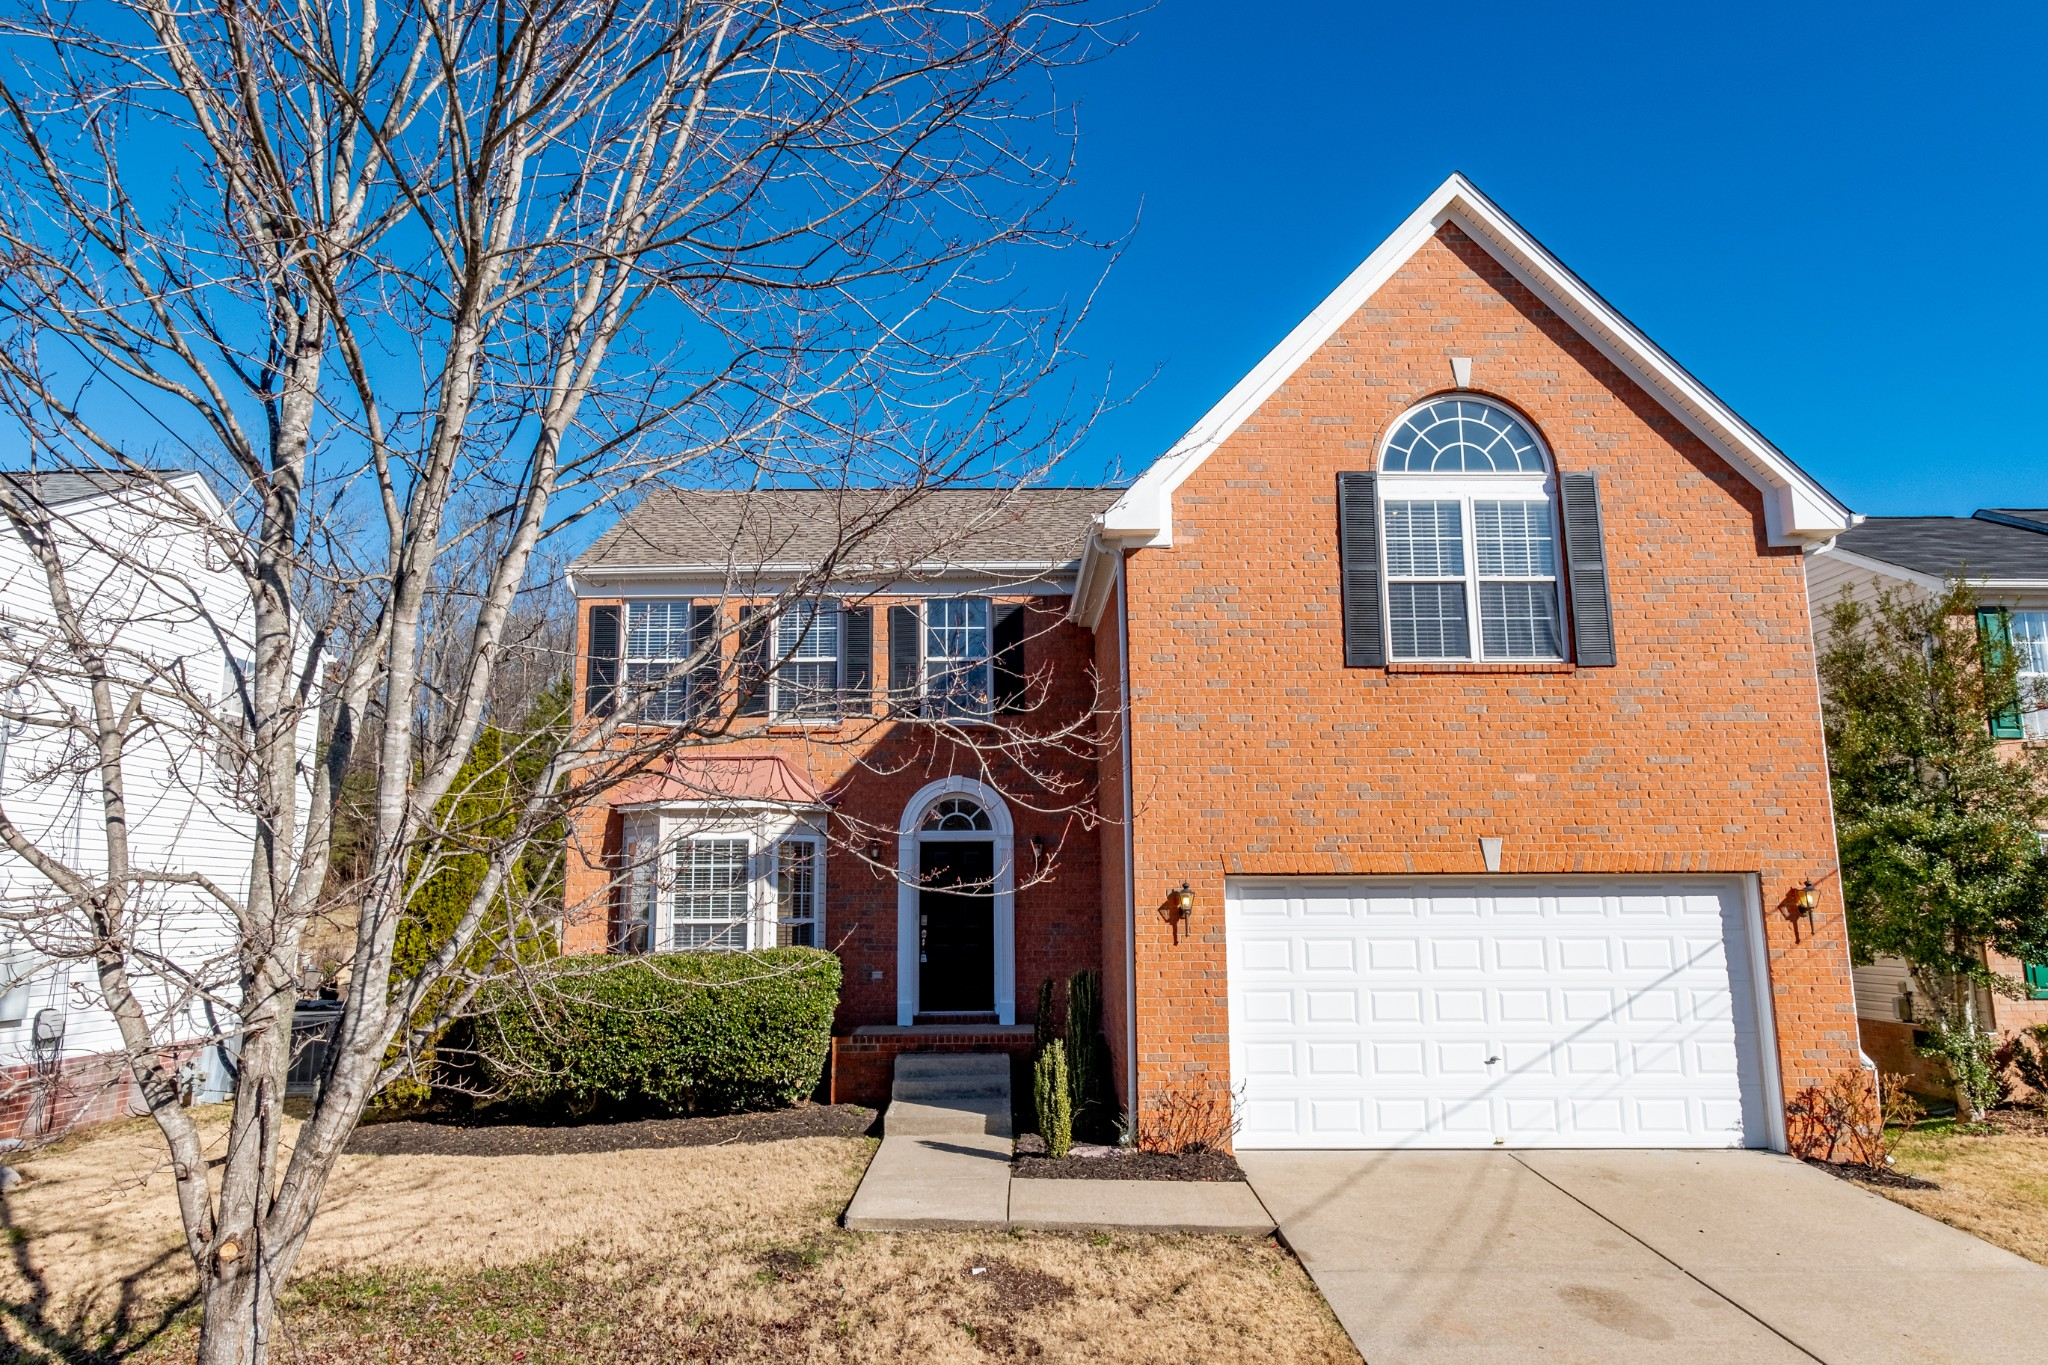 1840 Annalee Dr, Antioch, TN 37013 - Antioch, TN real estate listing